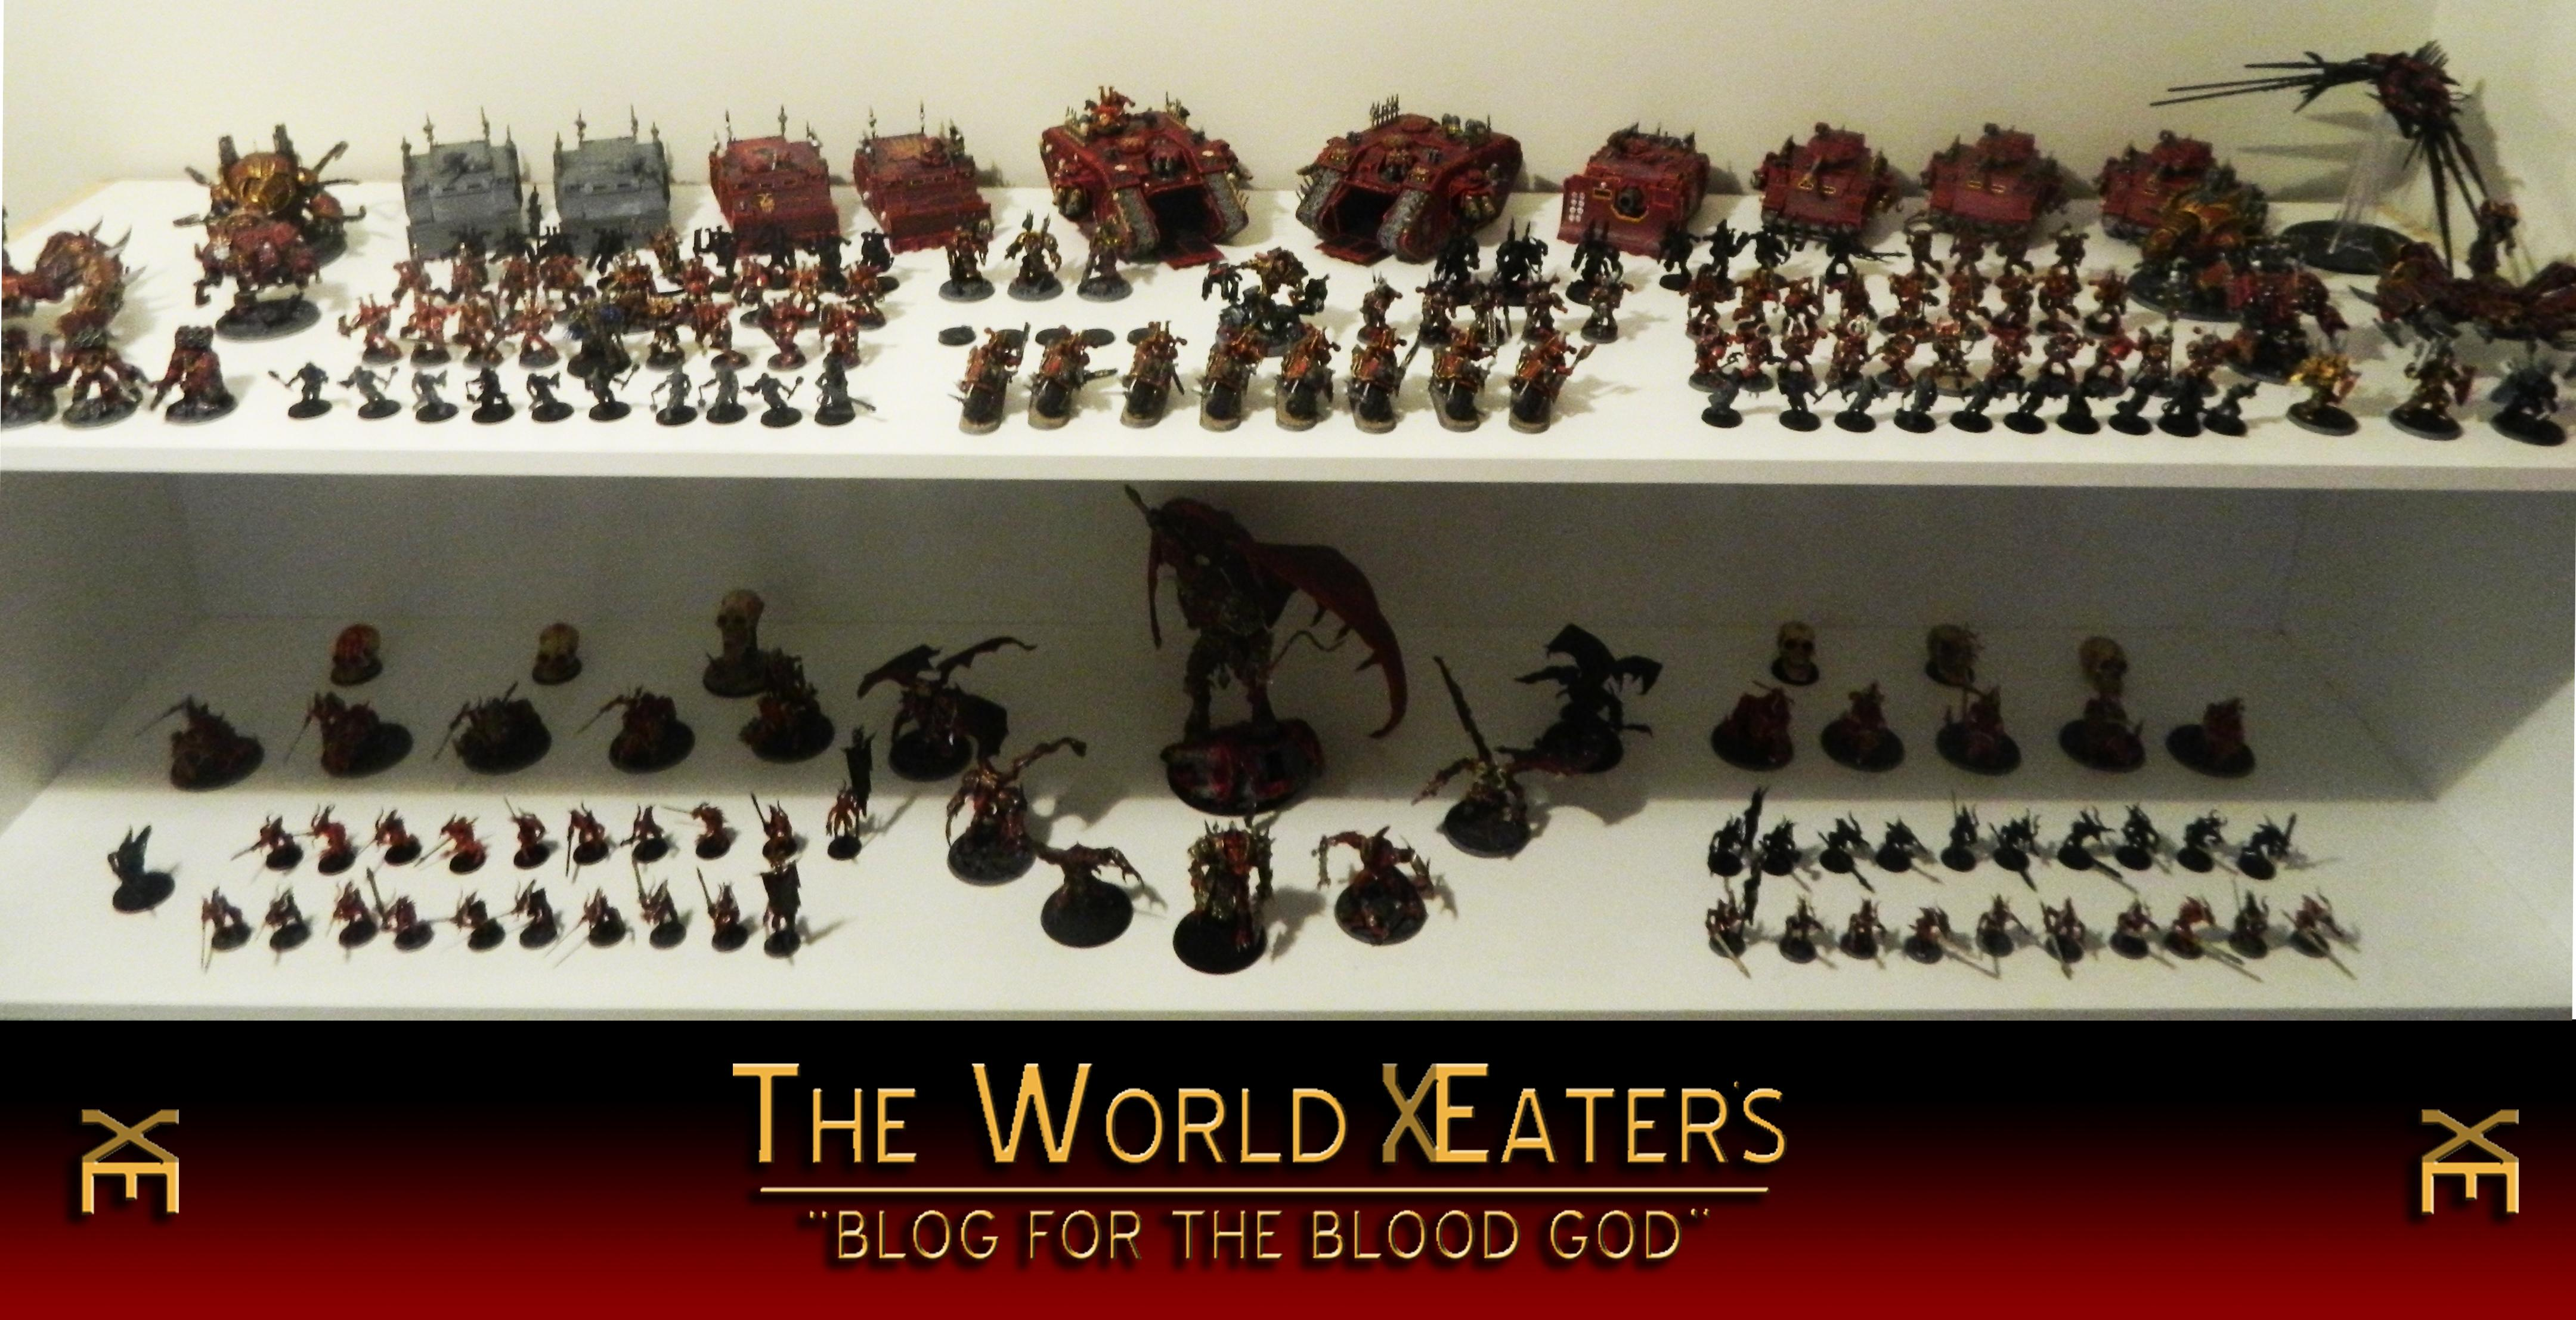 Anggrath, Angron, Army, Berserkers, Blood, Bloodcrushers, Bloodletters, Bloodthirster, Chaos, Chosen, Cultists, Daemon Prince, Daemons, Defiler, Forge World, Helbrute, Heldrake, Herald, Kharne, Khorne, Land Raider, Maulerfiend, Obliterators, Predator, Rhino, Skarbrand, Skull, Space Marines, Terminator Armor, Vindecator, World Eaters